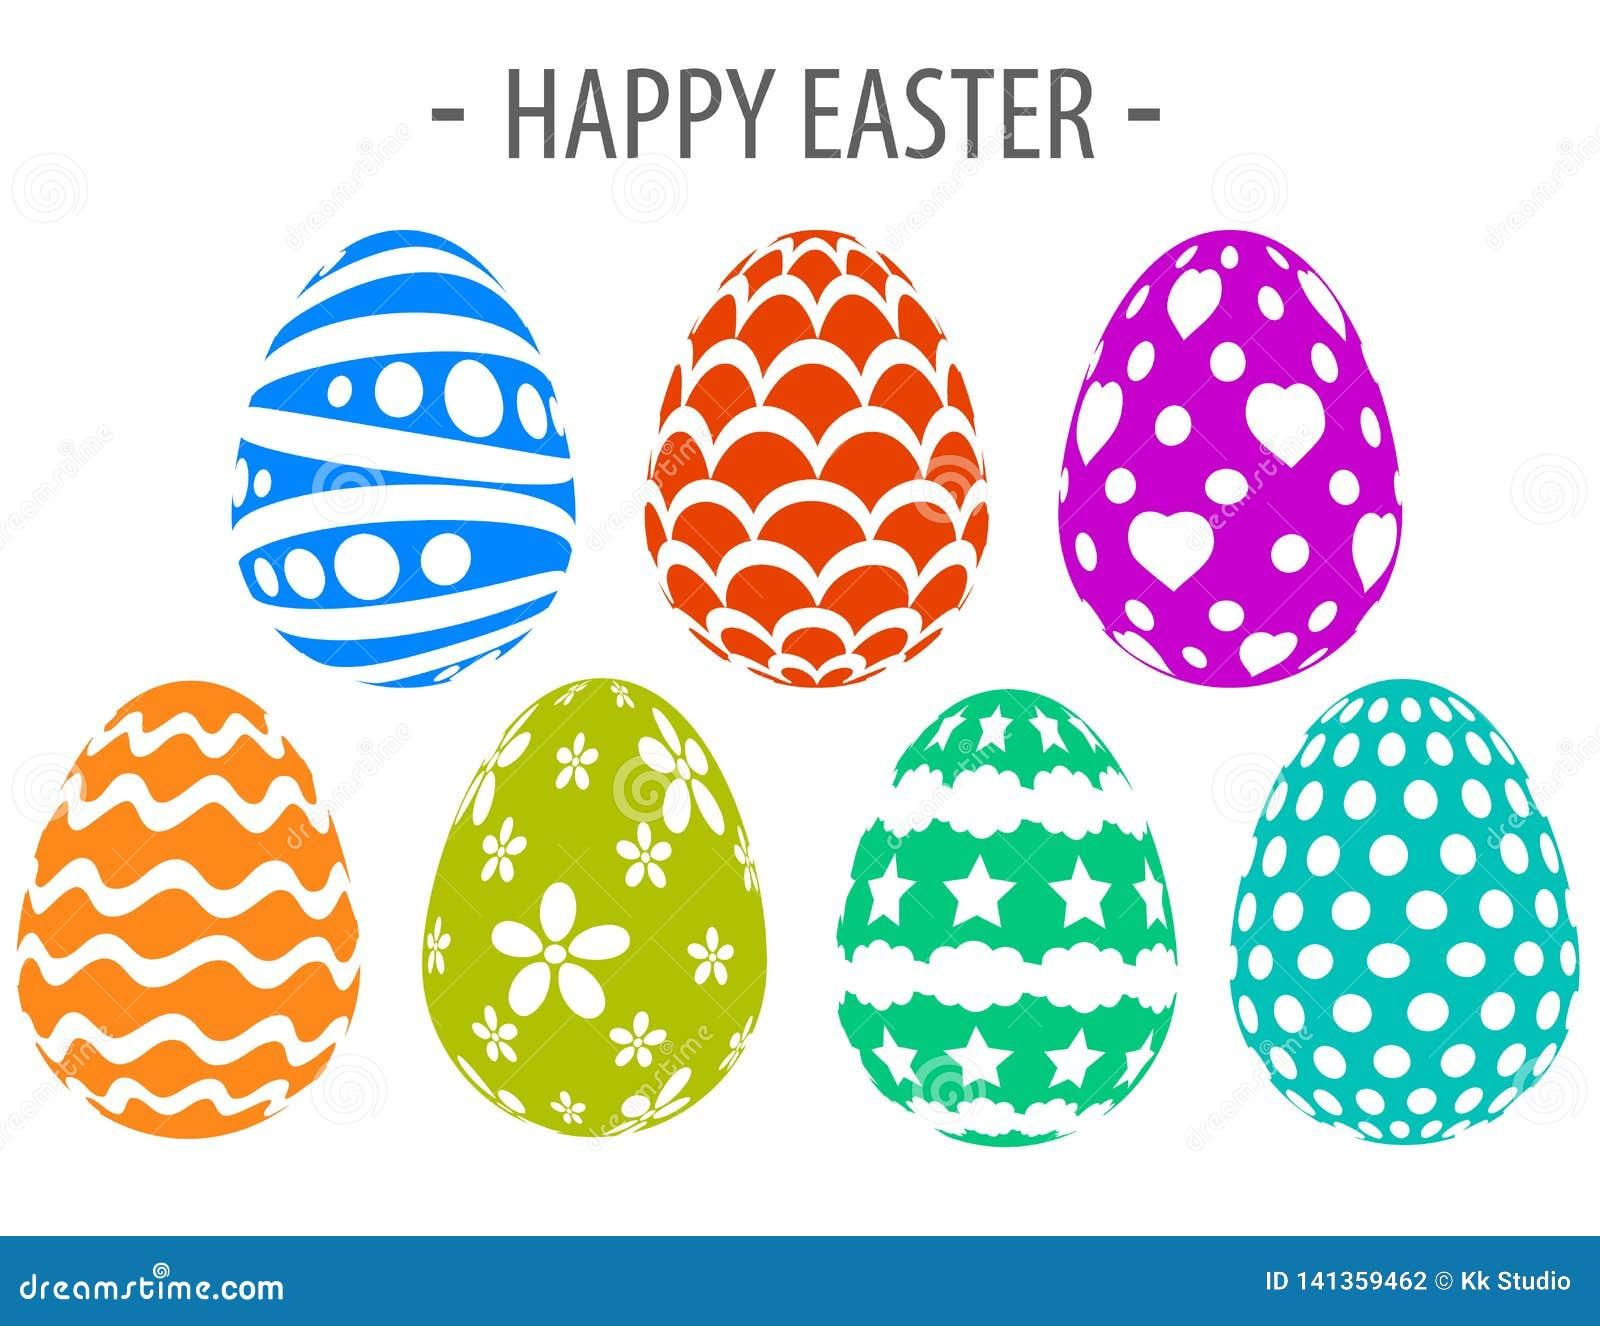 Happy easter silhouette paint eggs creative design